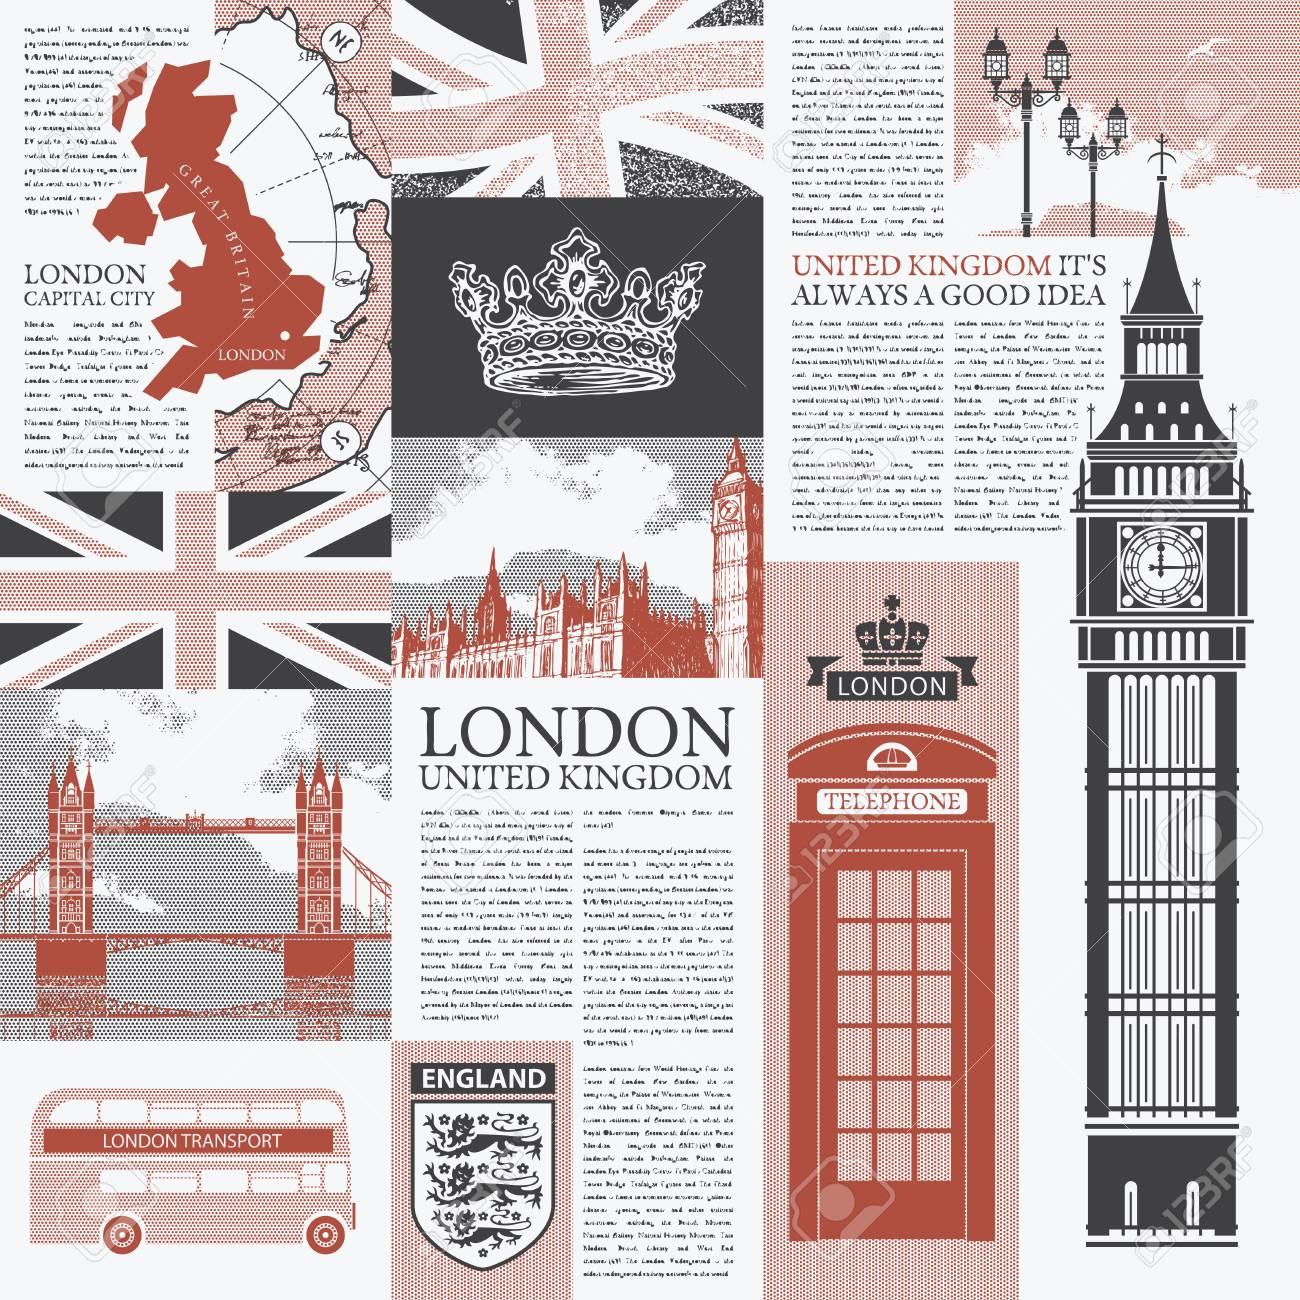 Uk pof london The #1